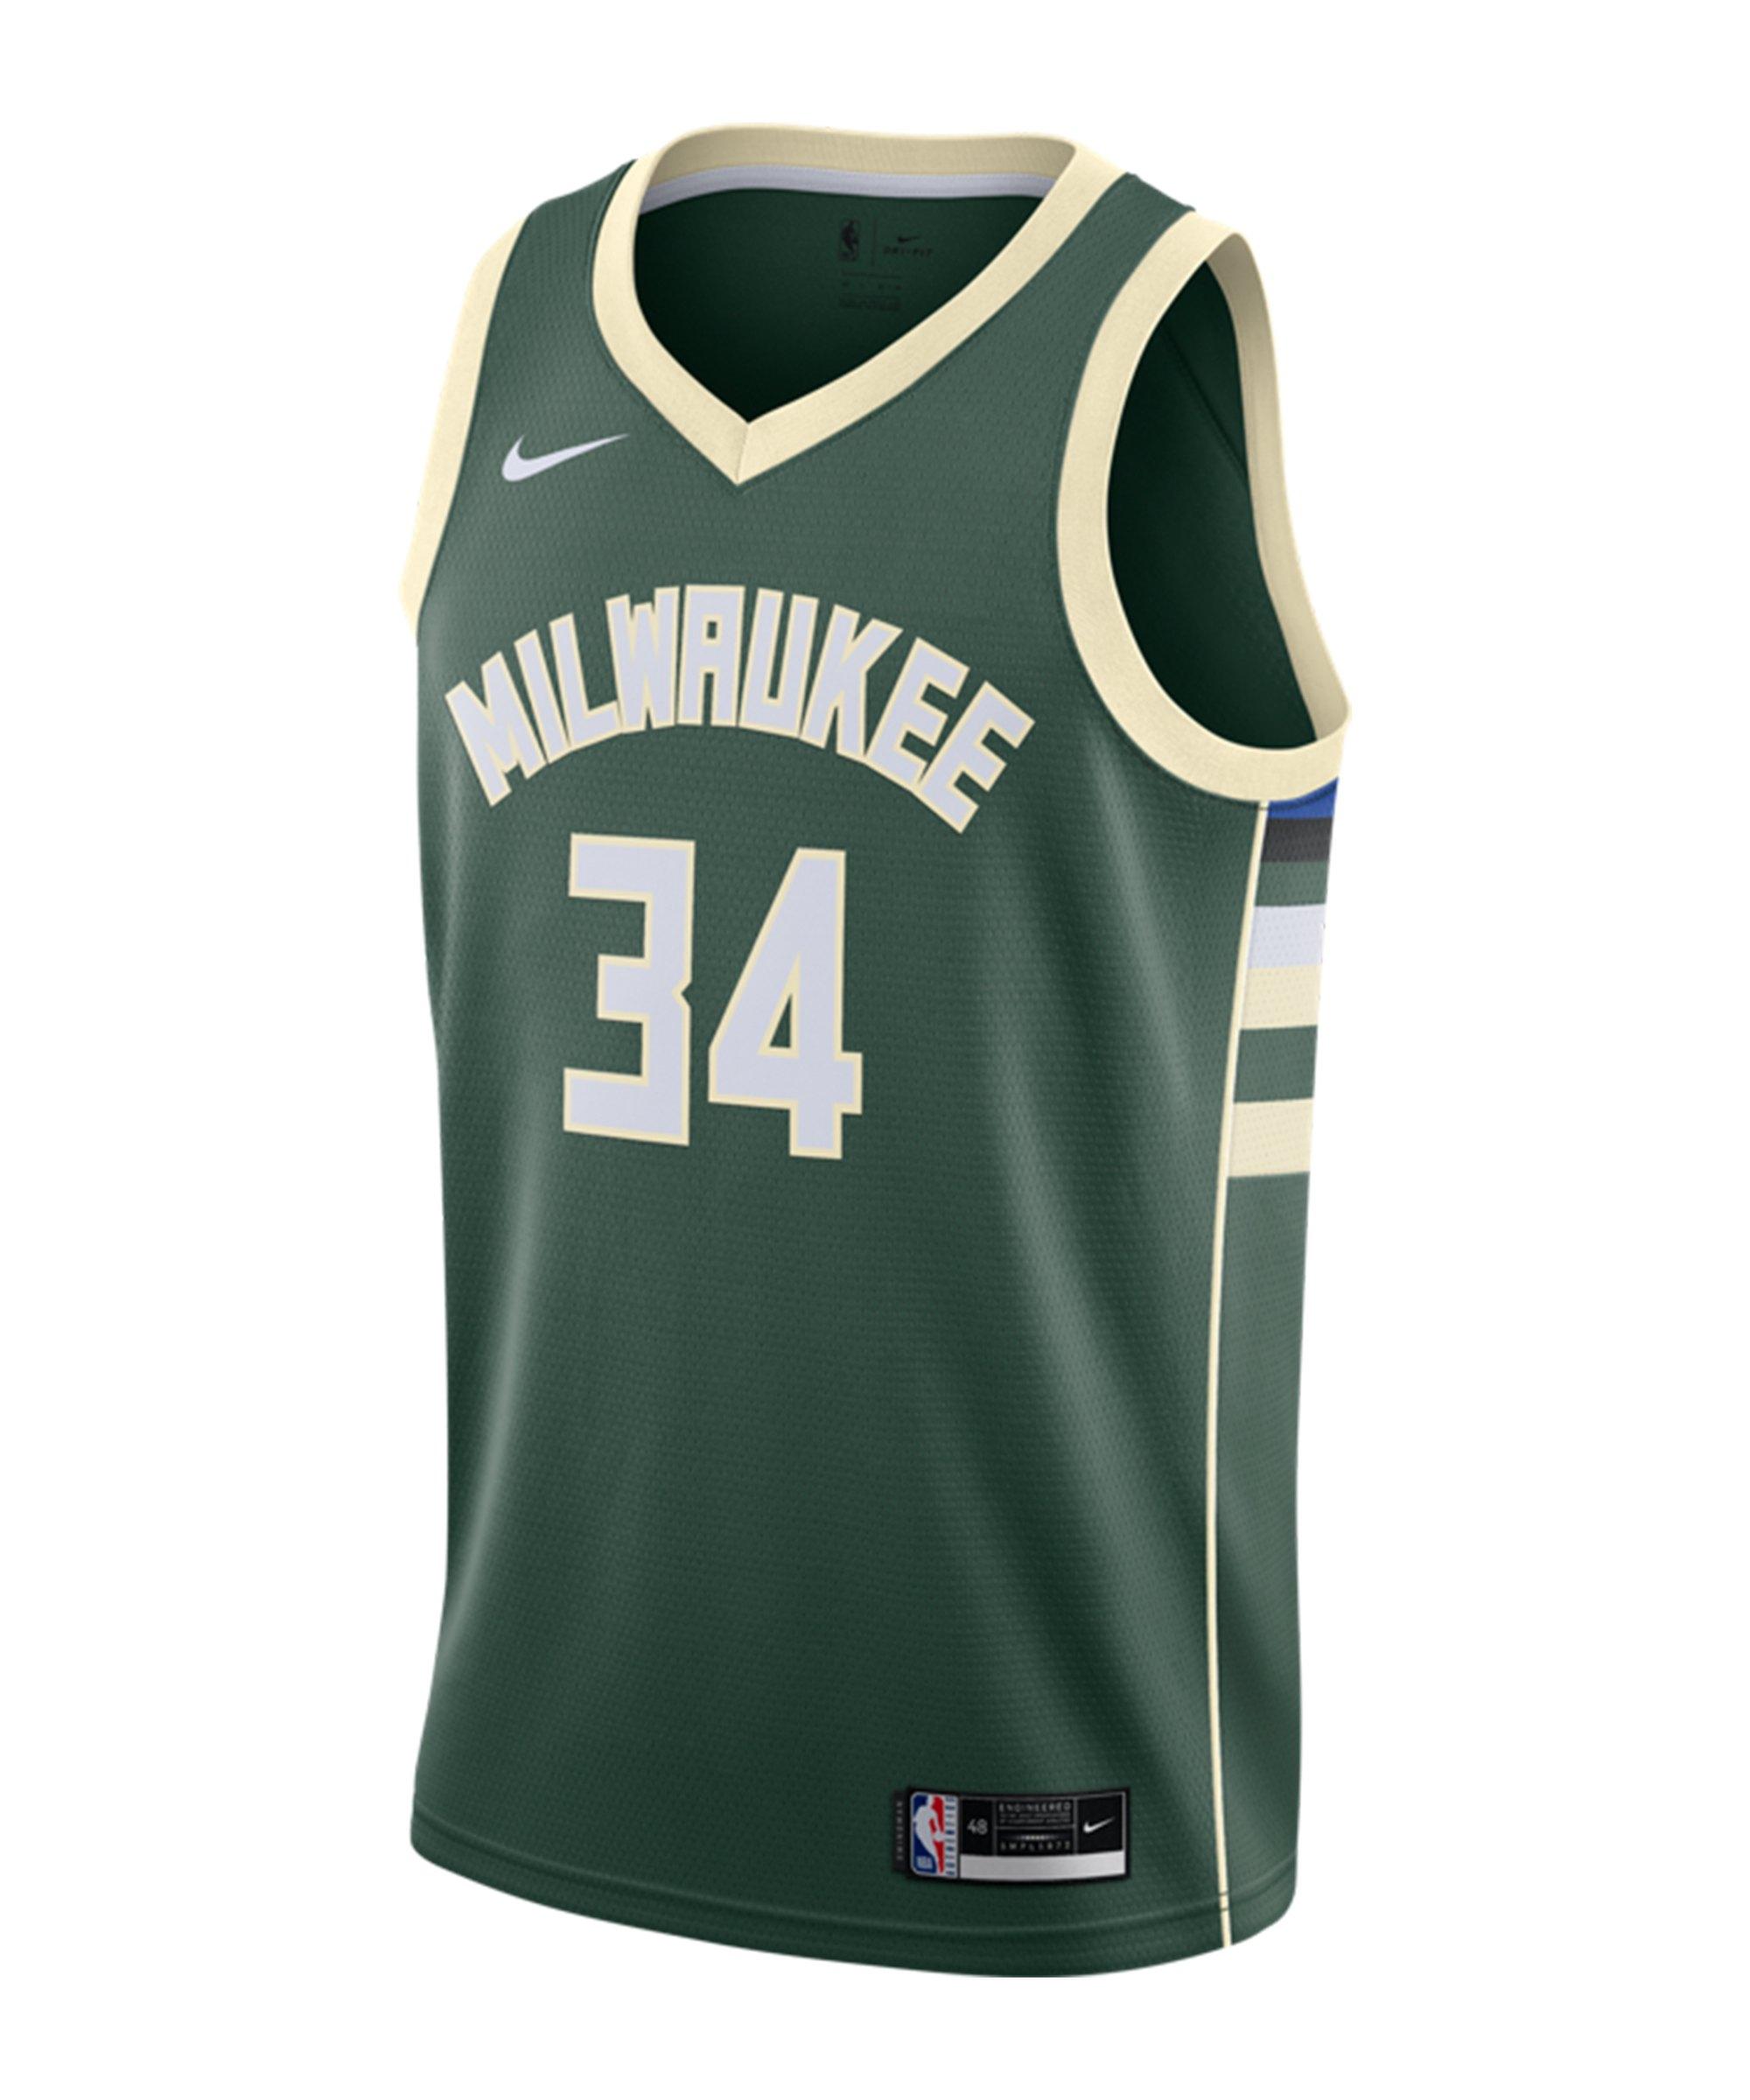 Nike Milwaukee Buck Jersey 2020 Grün F329 - gruen